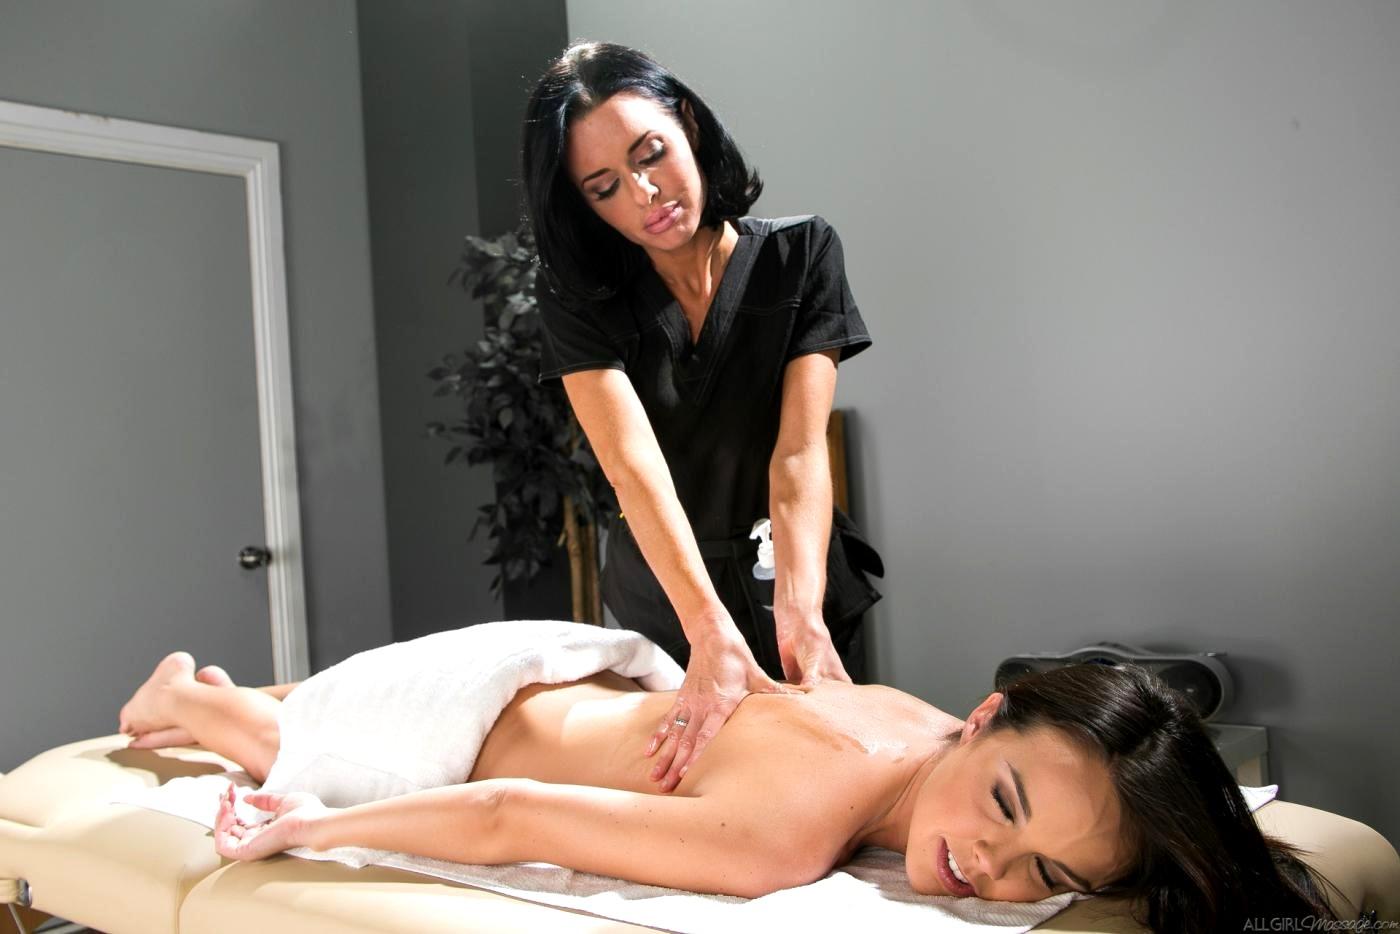 Порно видео массажистка соблазняет клиента